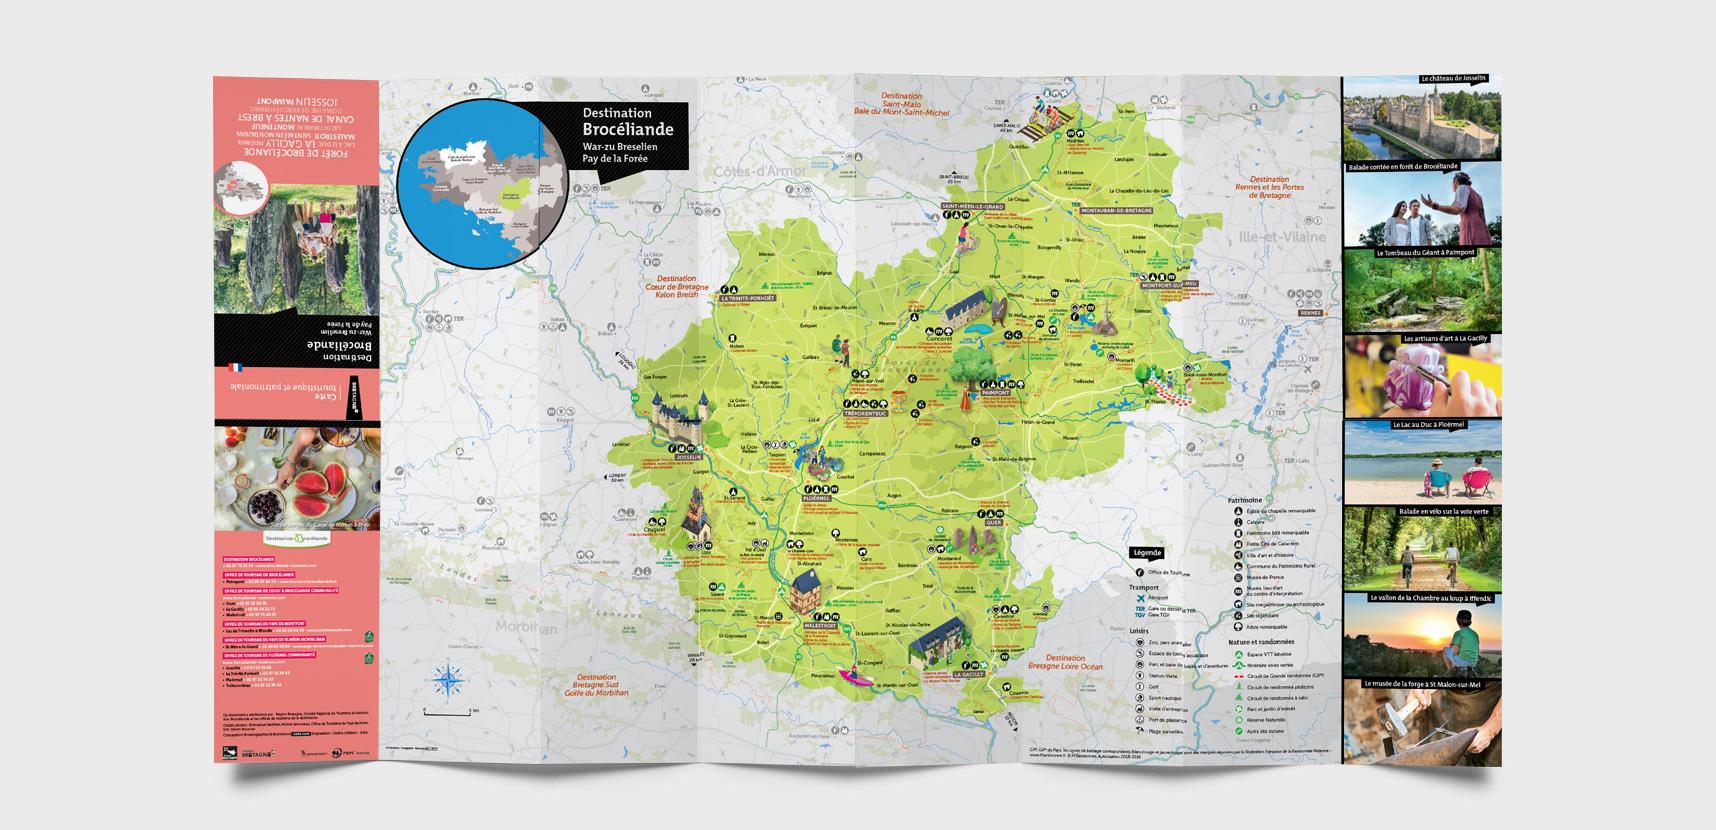 IZATIS_CRTB_carte_destination_broceliande_recto